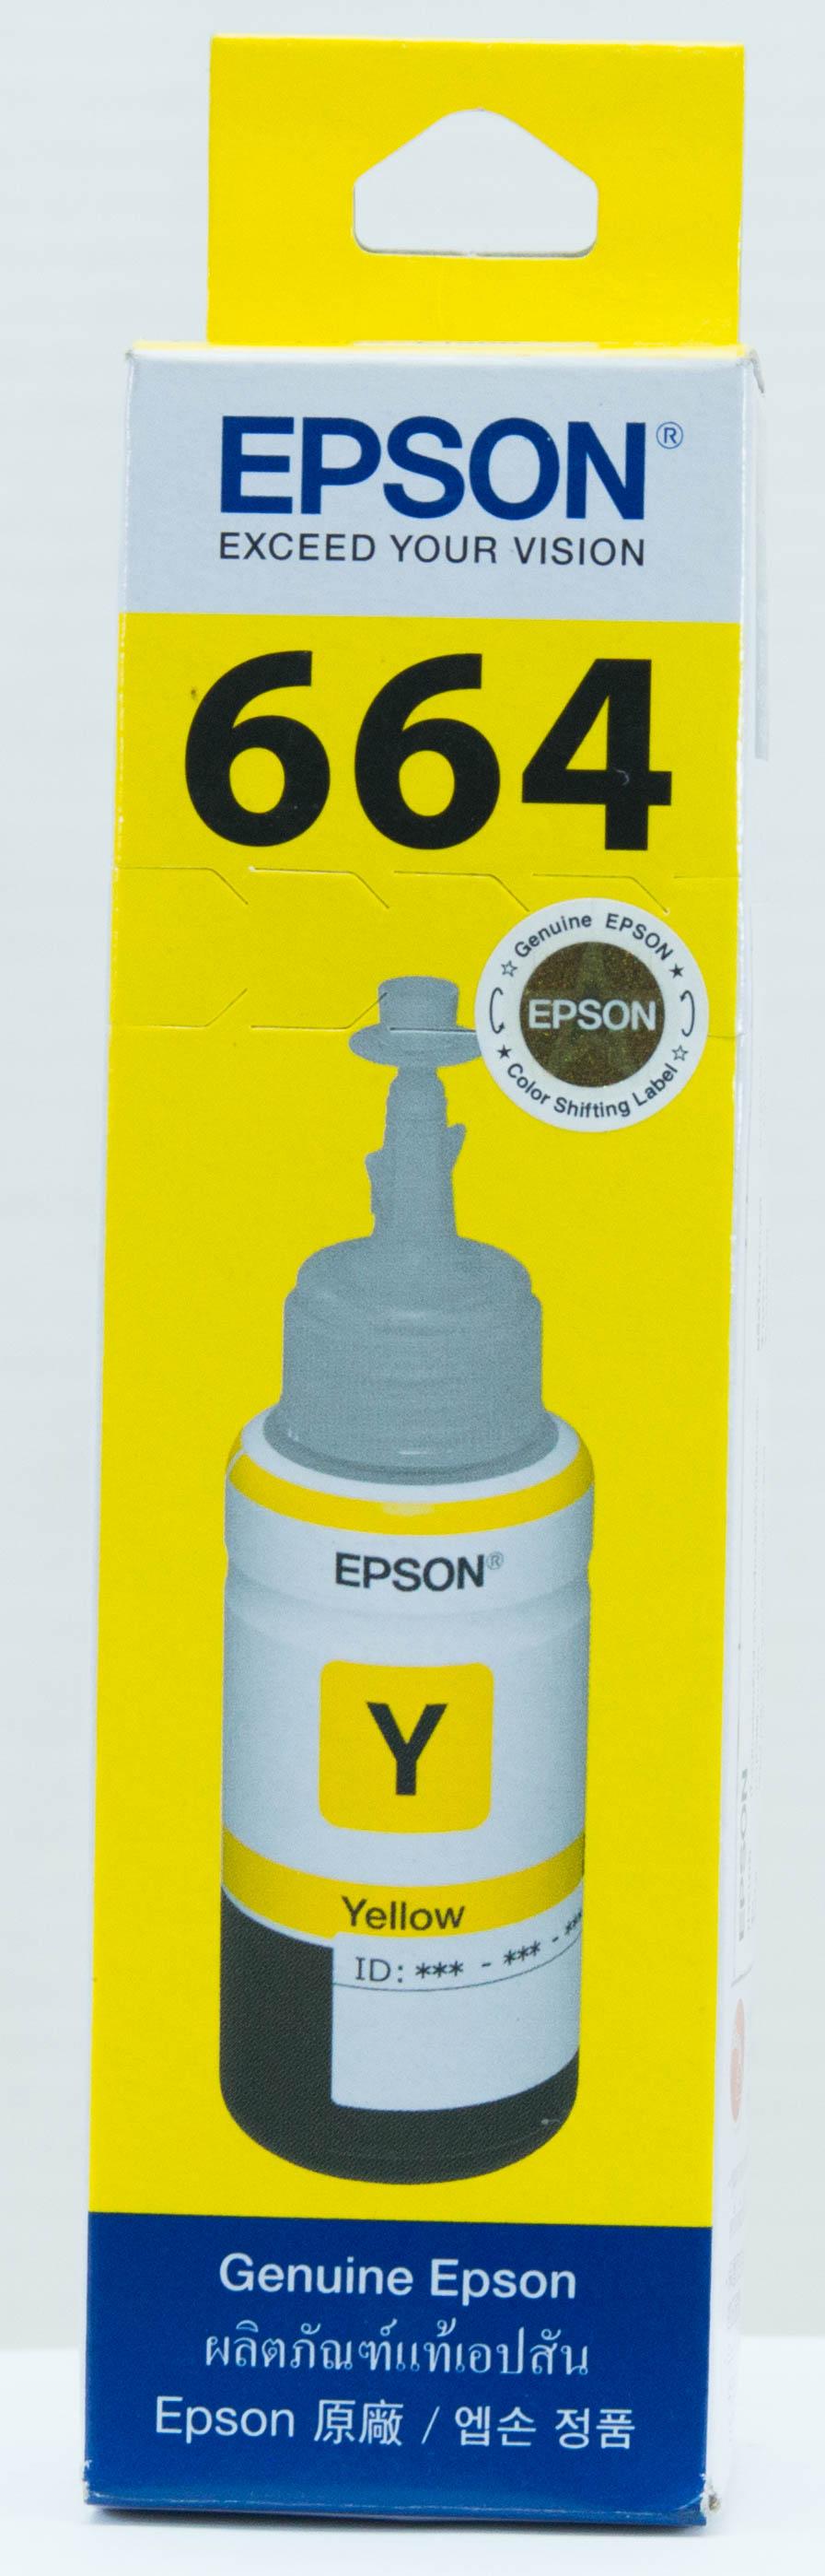 Epson หมึกเติม L-Series สีดำ รุ่น T6641 (Yellow)